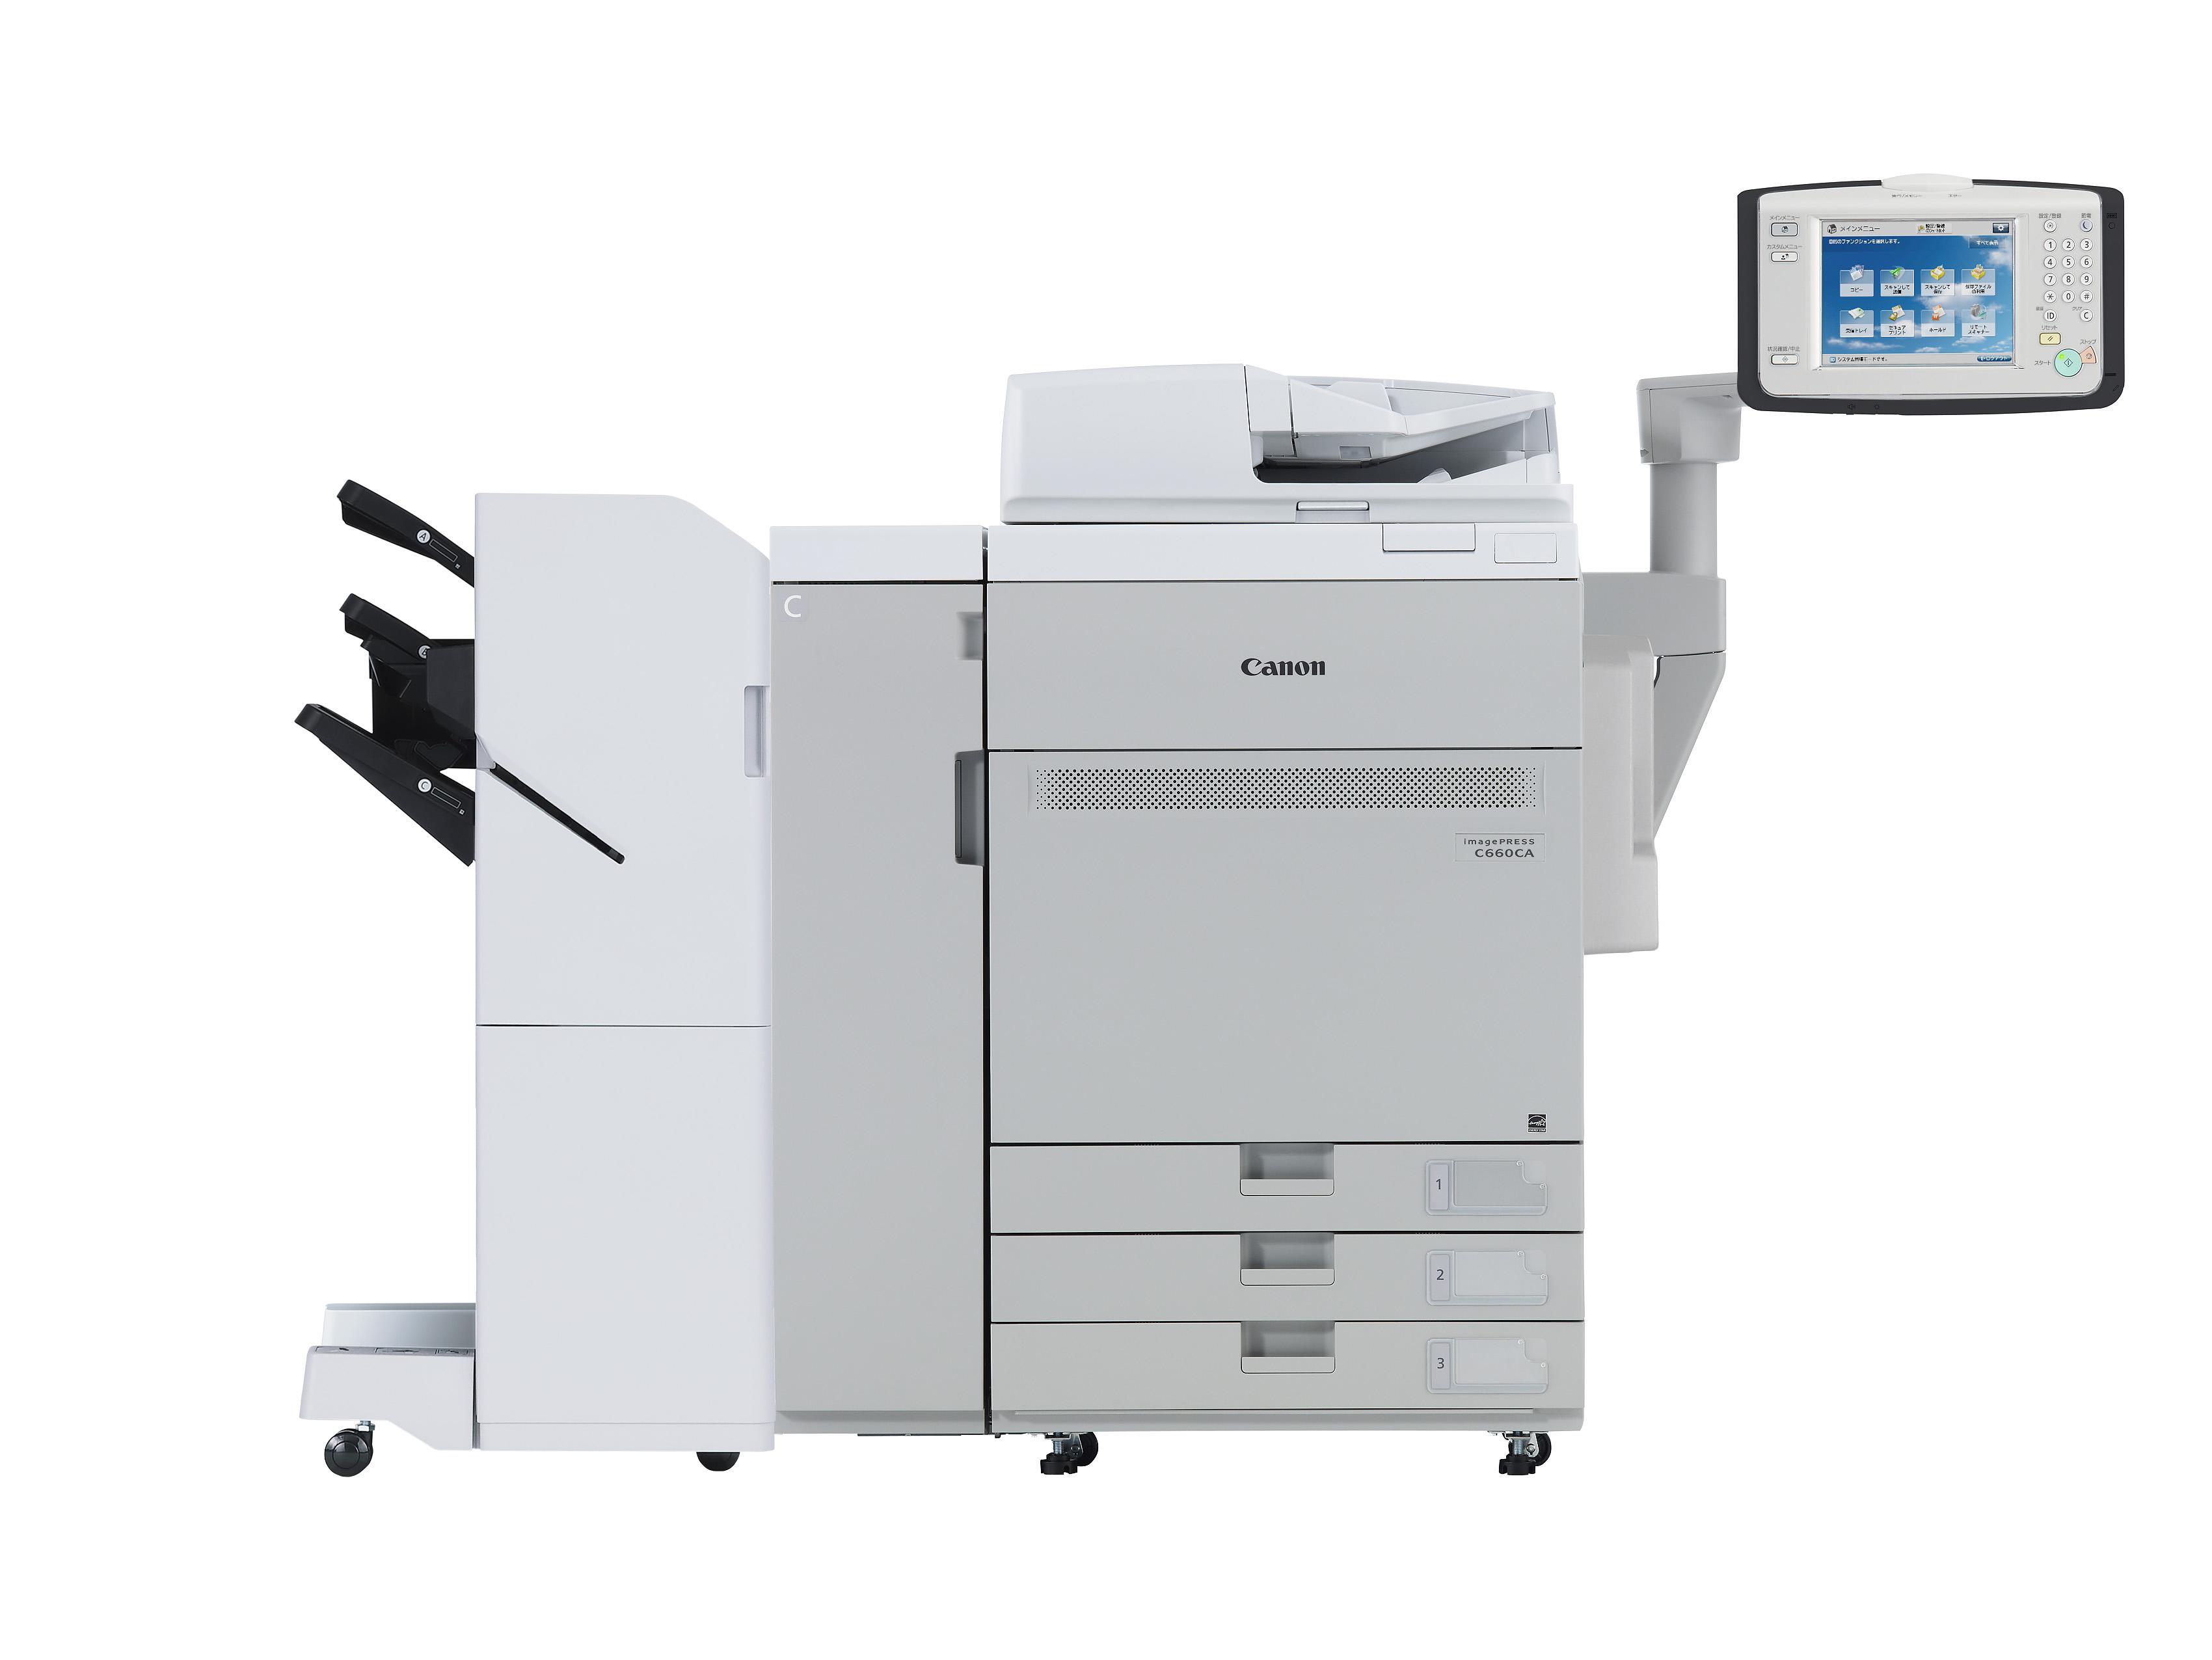 imagePRESS C910/810/710